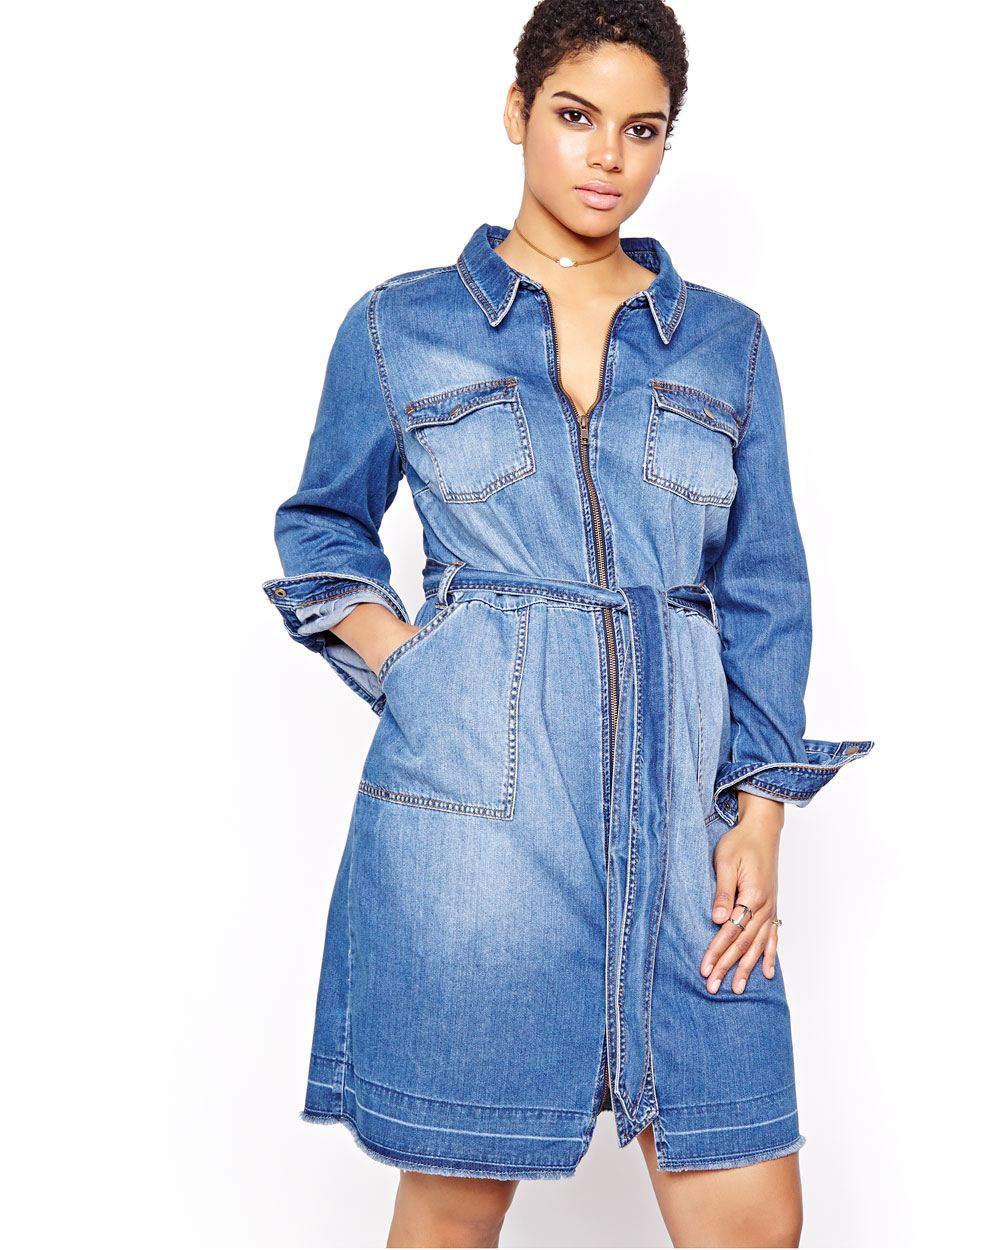 L&L Denim Shirt Dress at AdditionElle